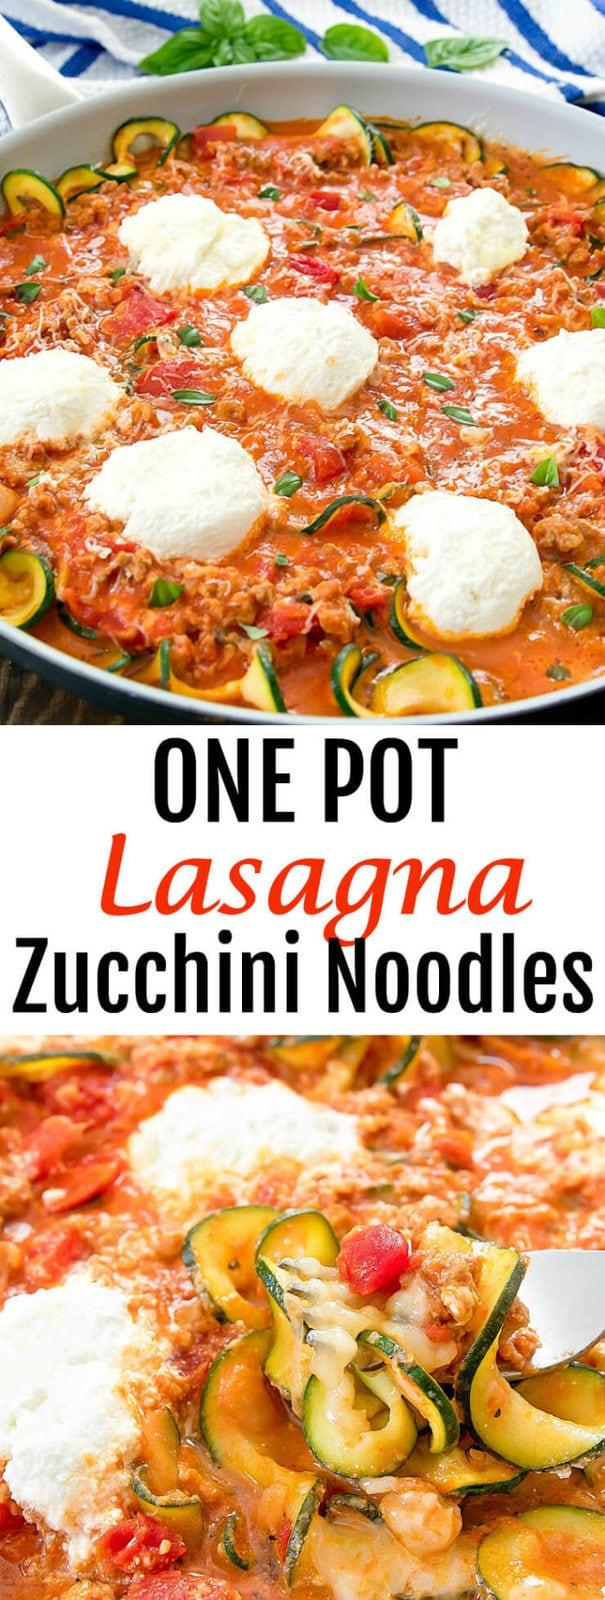 One Pot Lasagna Zucchini Noodles